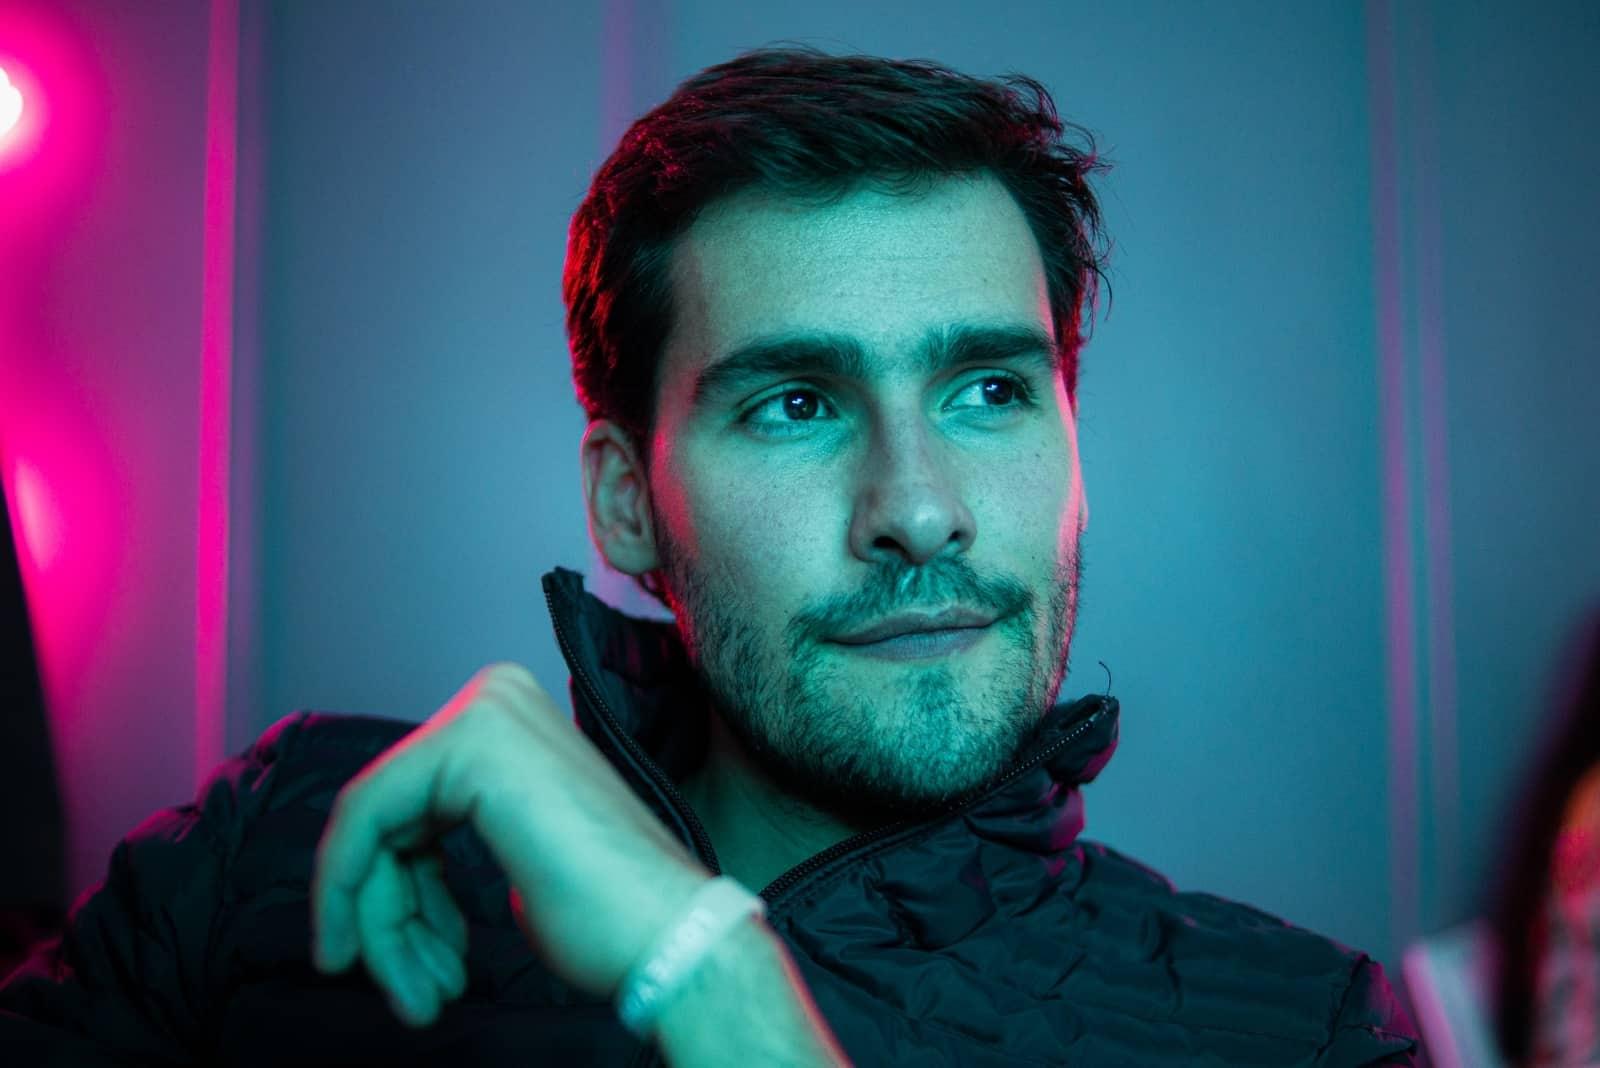 man smiling while sitting near neon light